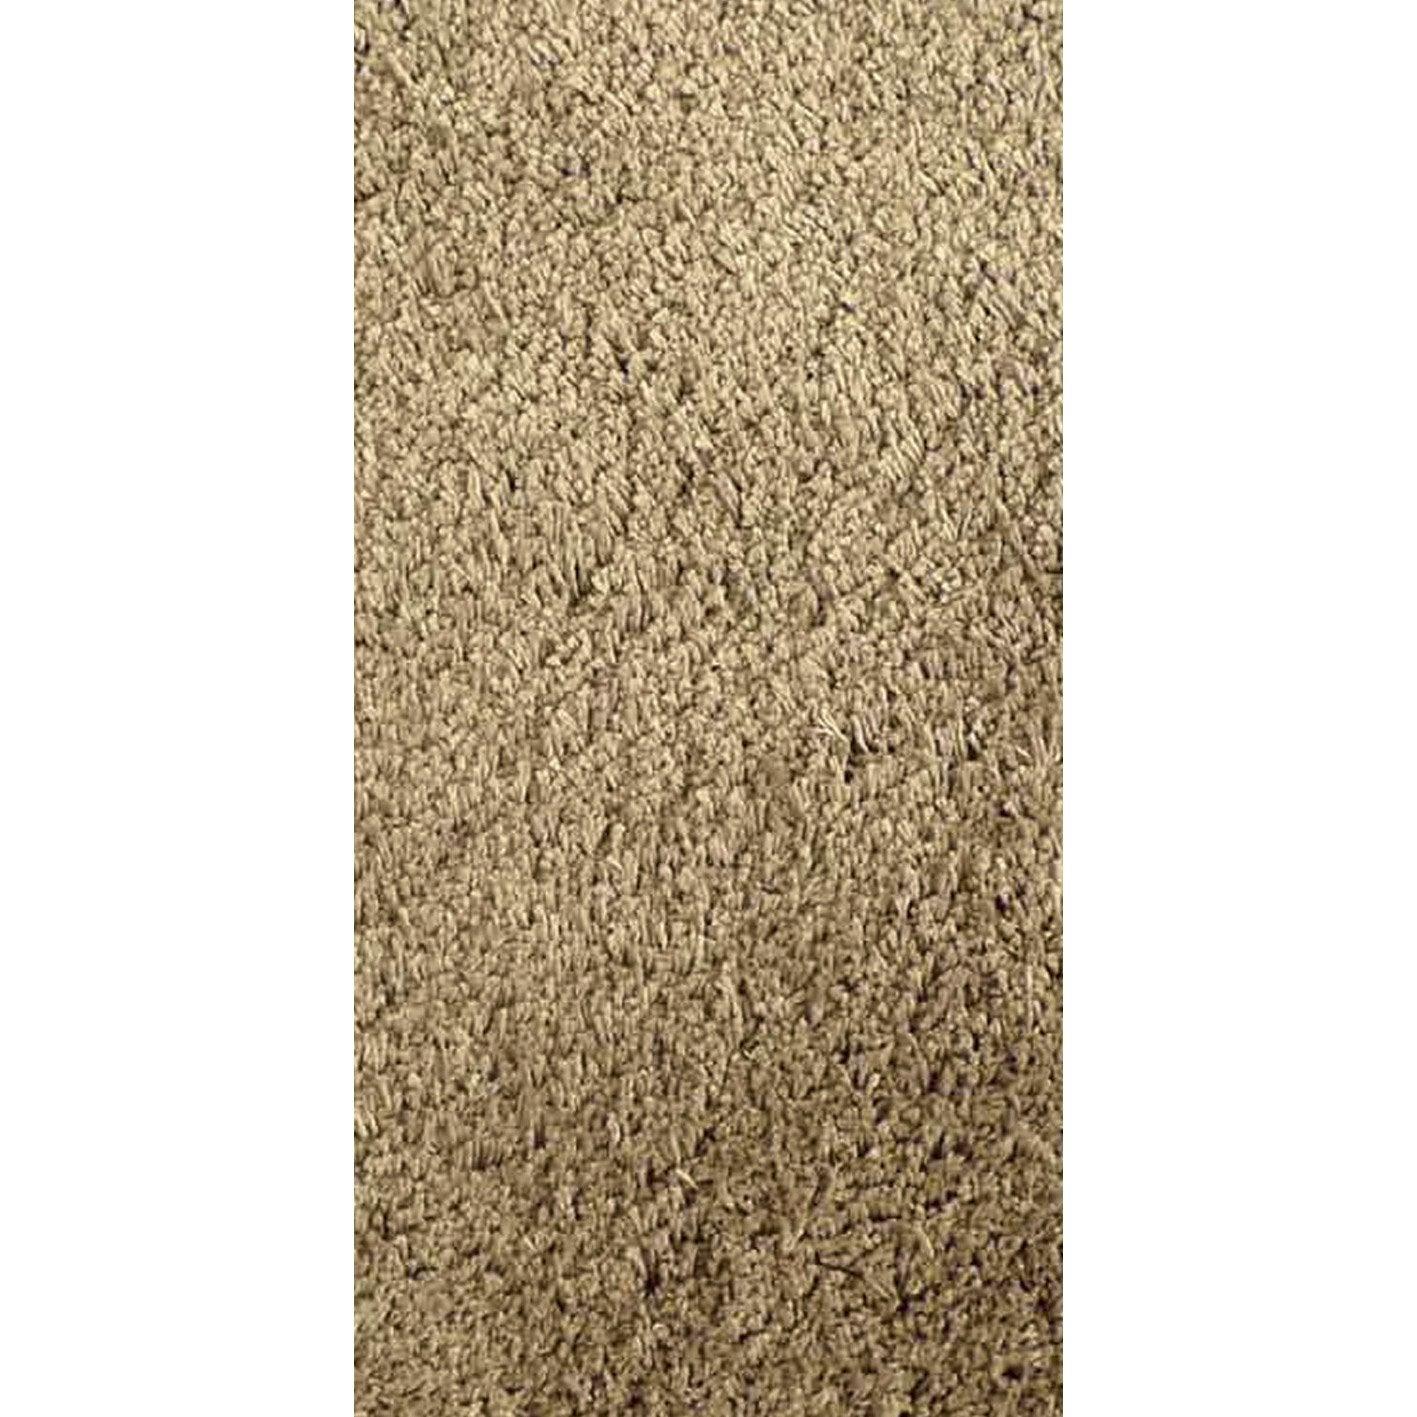 tapis shaggy agathe brun taupe n 3 120x60 cm leroy merlin. Black Bedroom Furniture Sets. Home Design Ideas